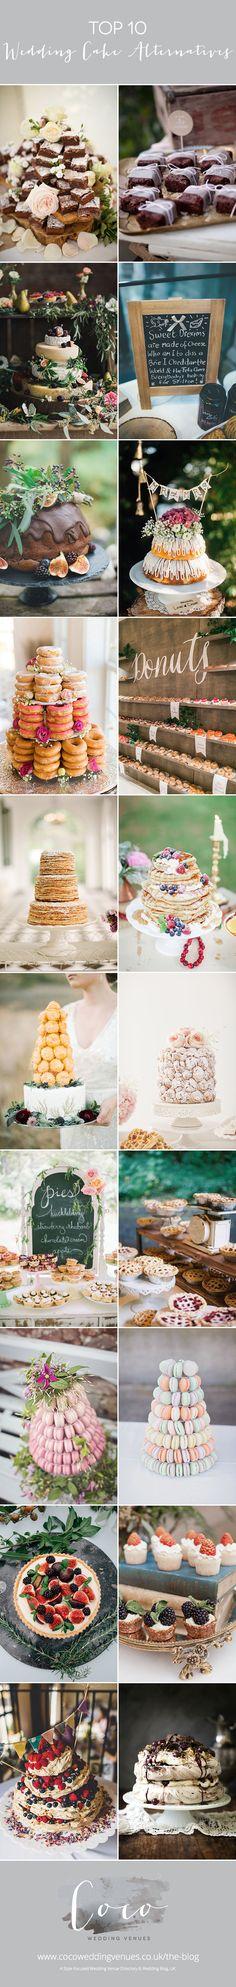 10 Wedding Cake Alternatives | UK Wedding Venues Directory